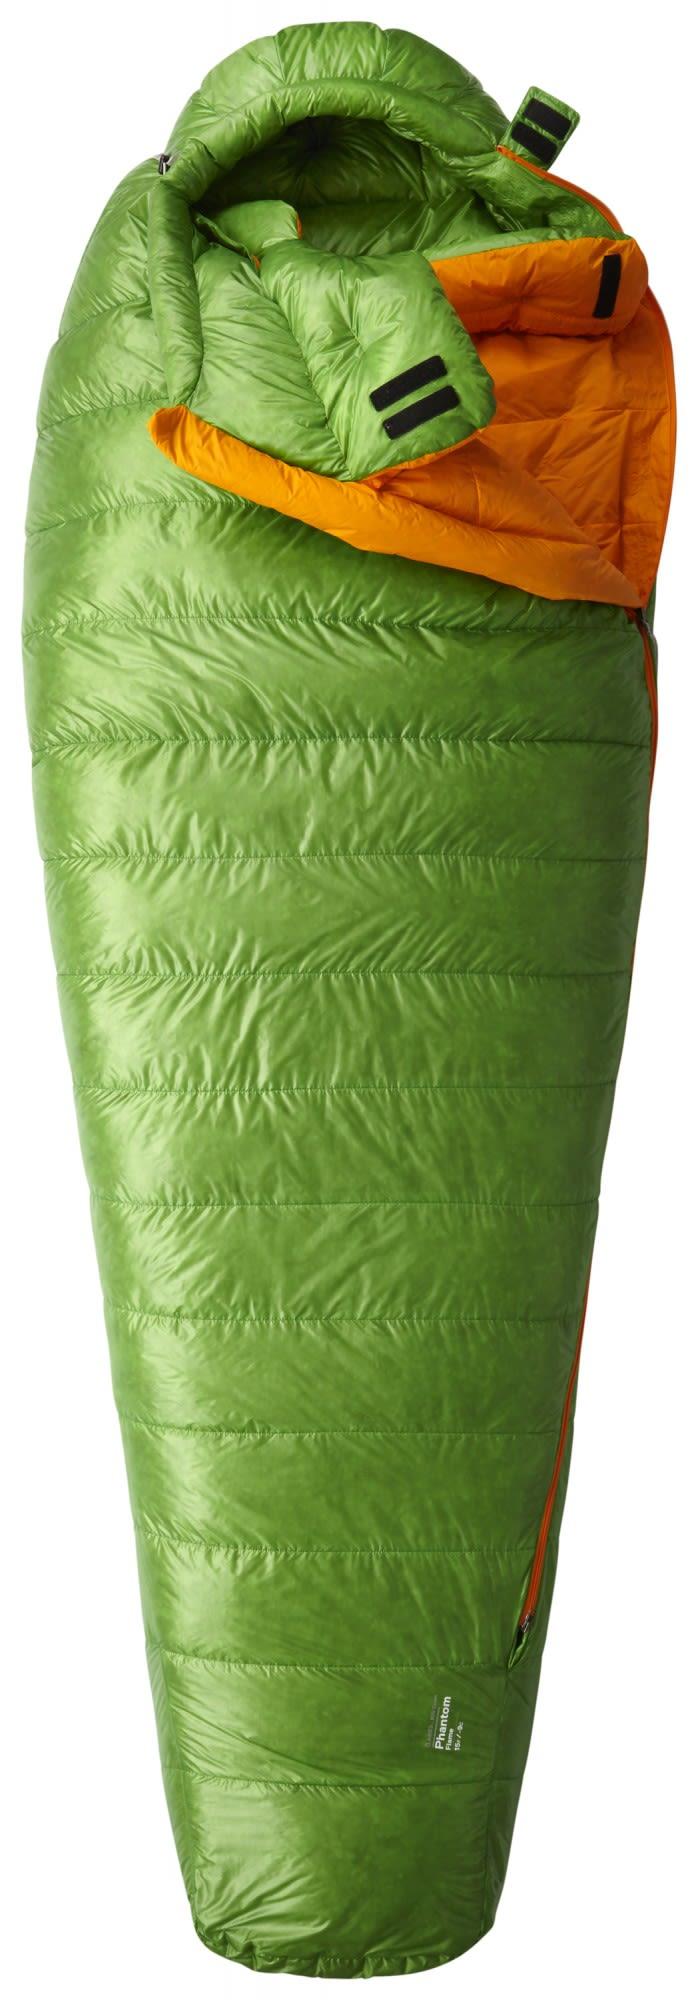 Mountain Hardwear Phantom Flame Long Grün, Daunen Kunstfaserschlafsack, 198 cm